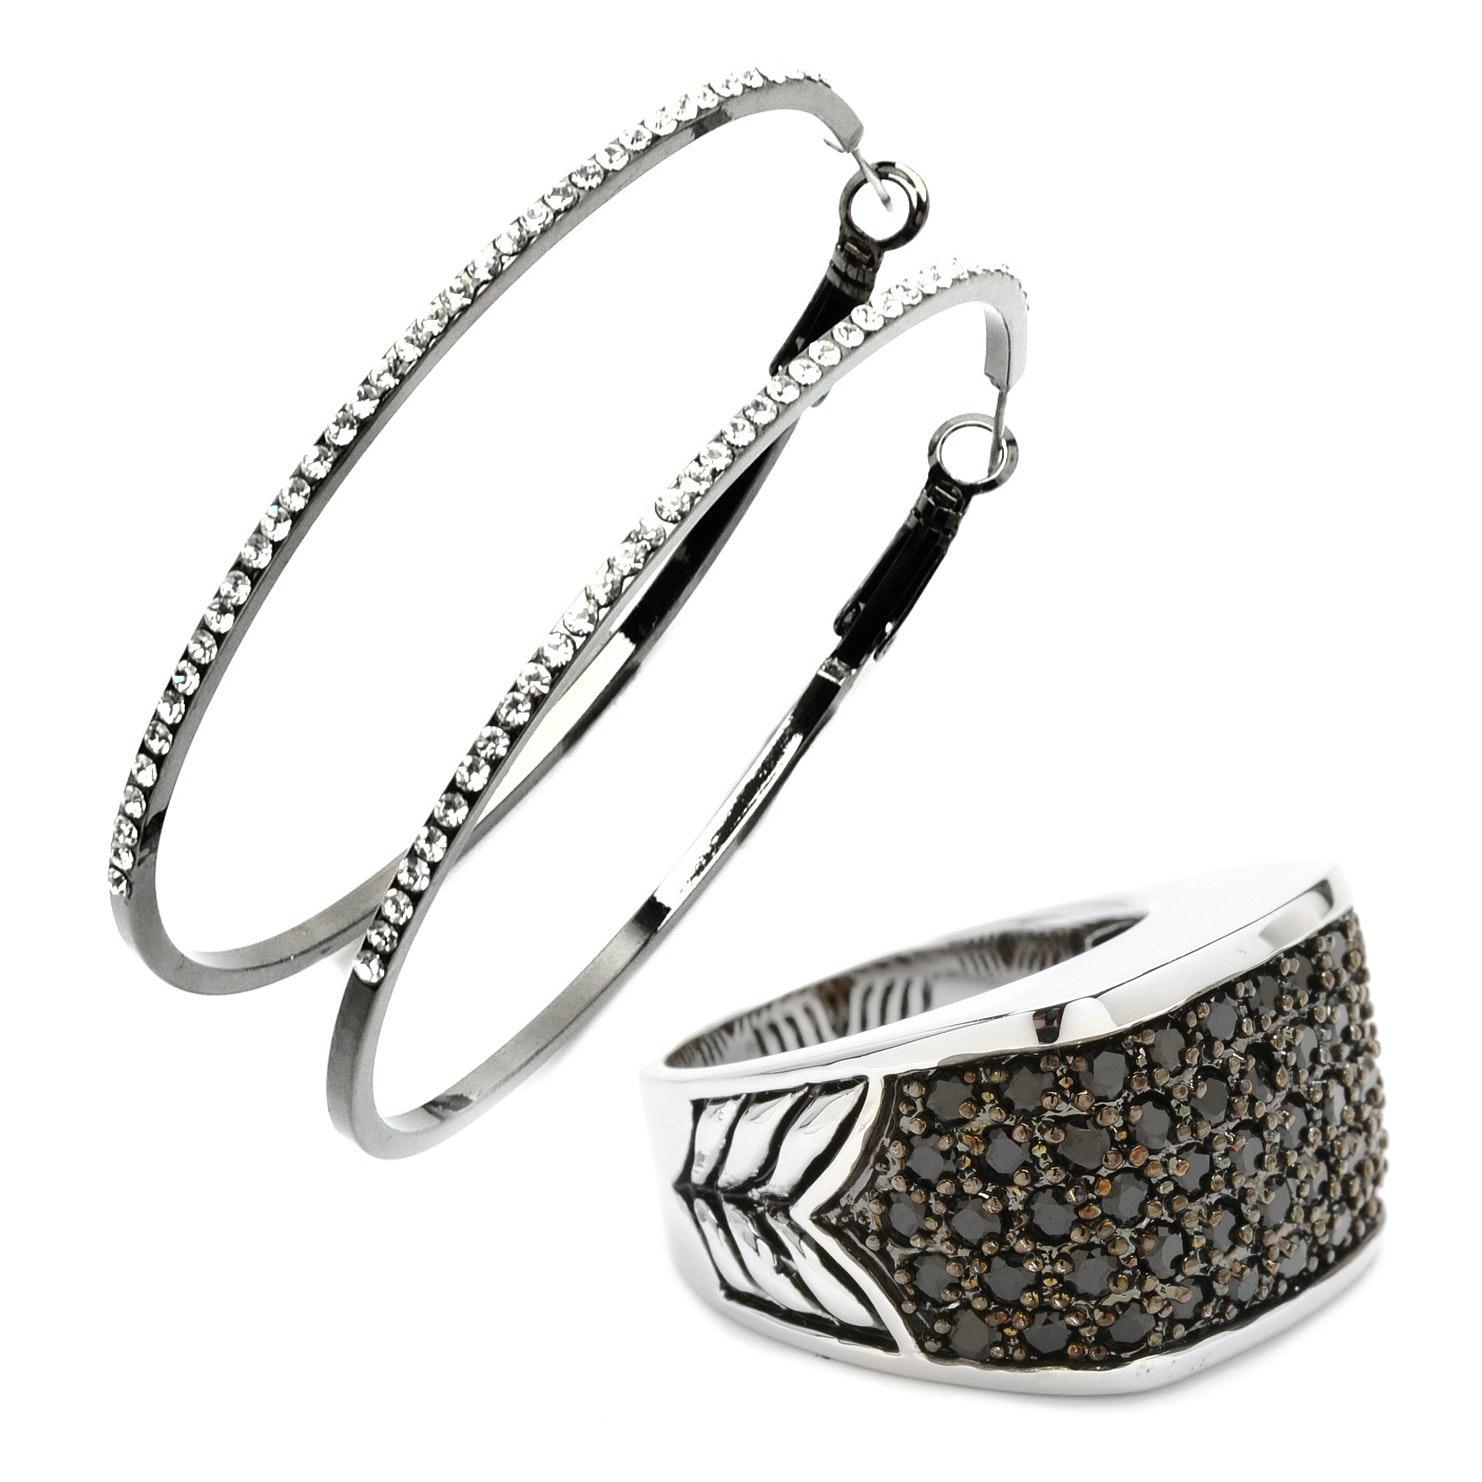 Park Lane Crystal Encrusted Ring and Pierced Earrings